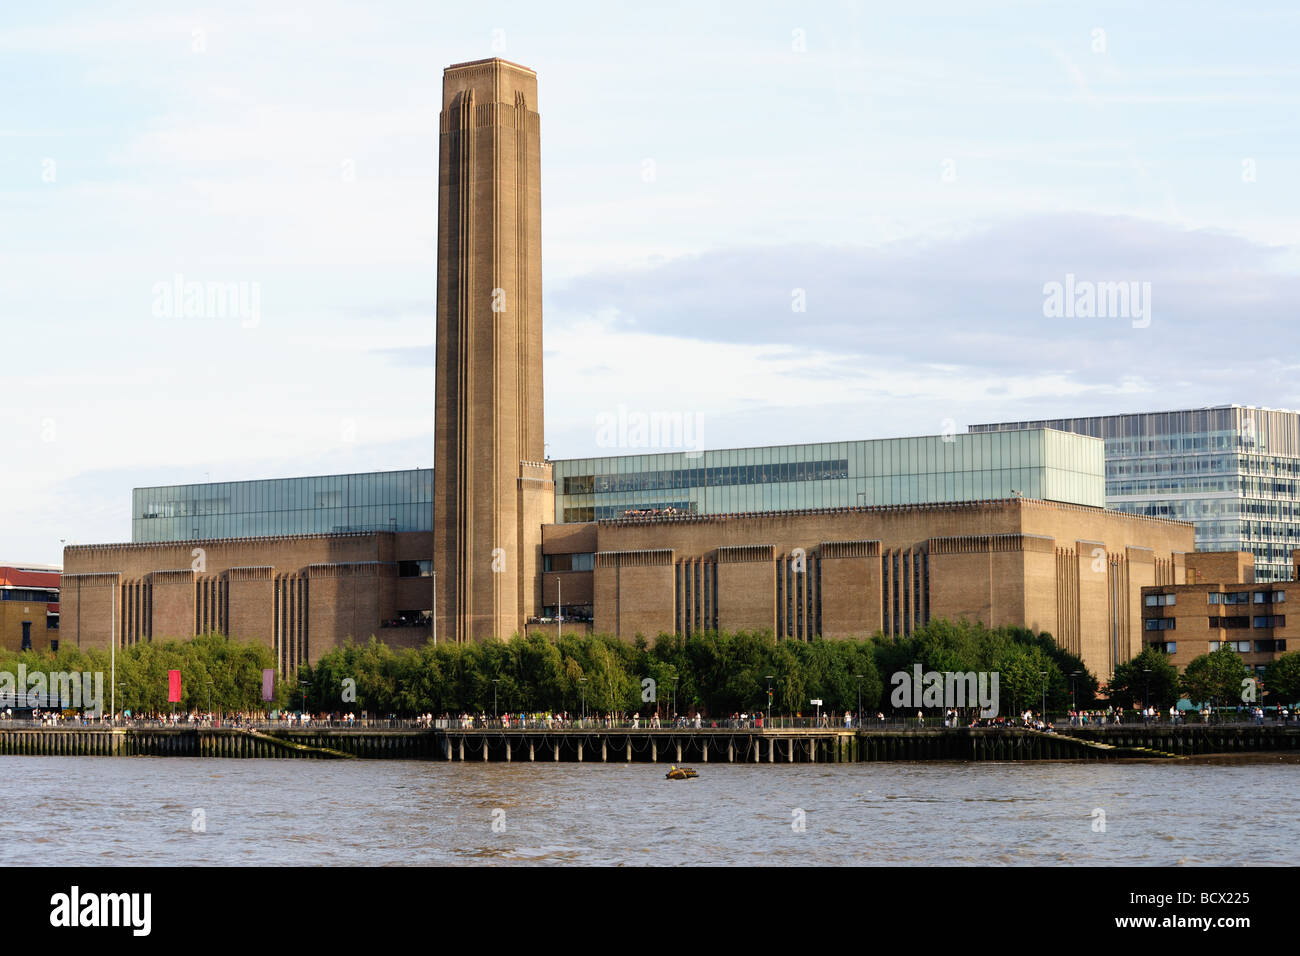 Tate Modern, national museum of international modern art, the disused Bankside power station, London, England, UK, - Stock Image